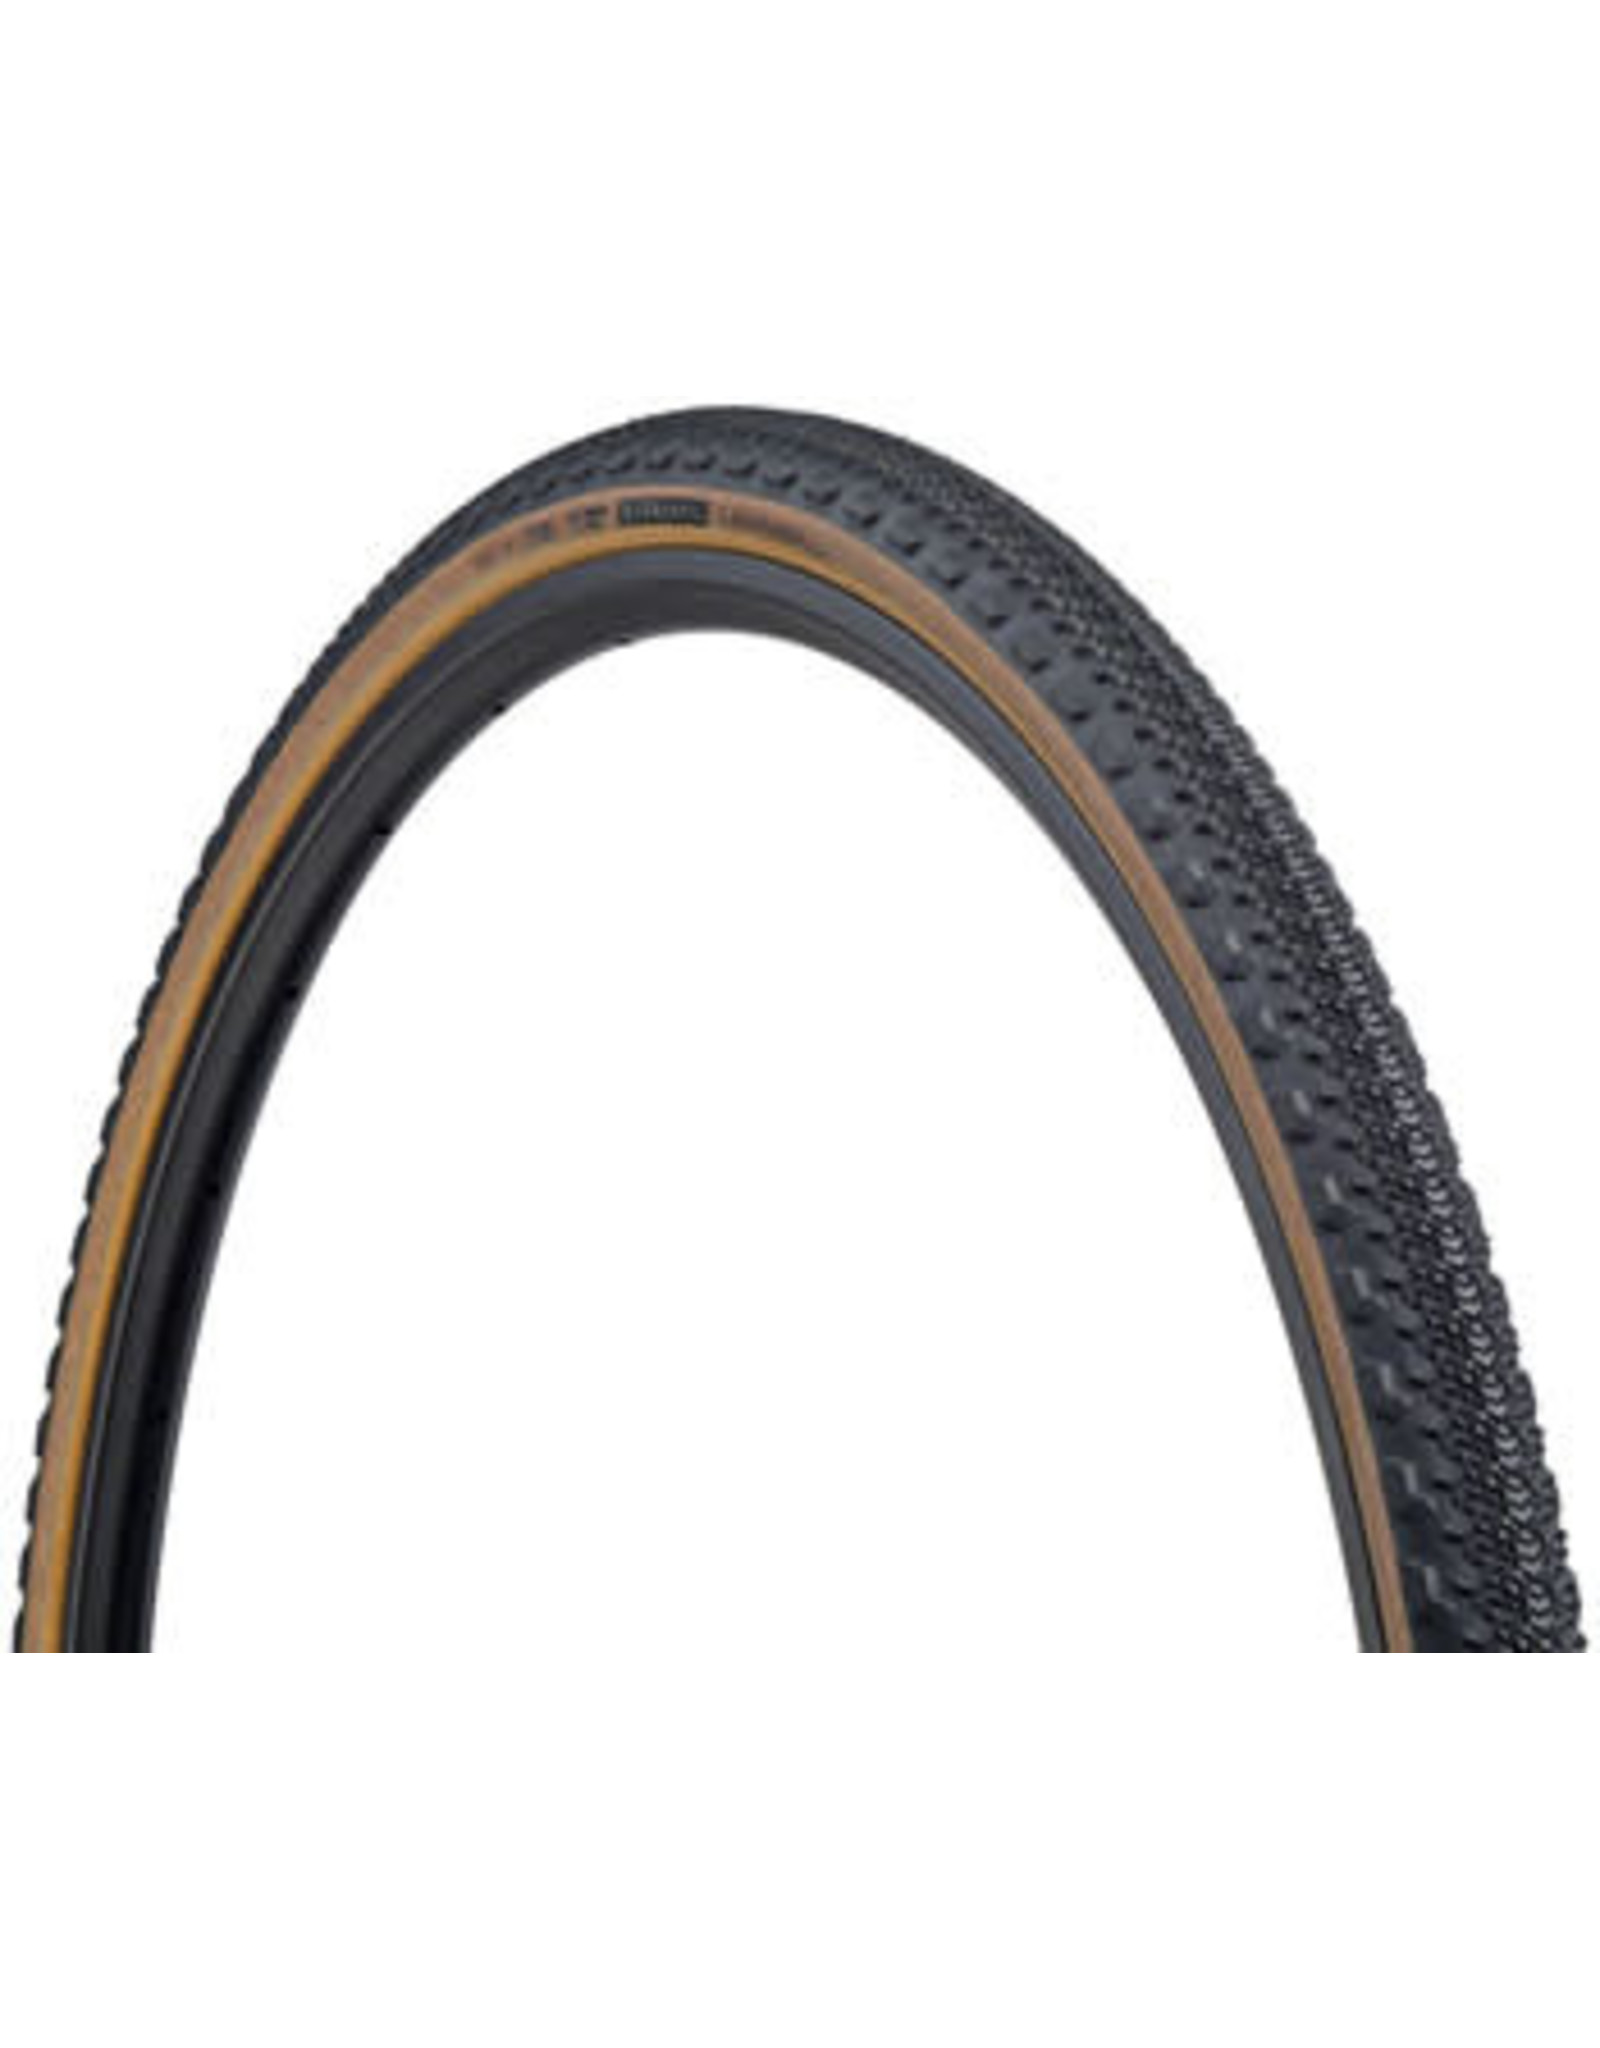 Teravail Teravail Cannonball Tire - 700 x 35, Tubeless, Folding, Tan, Light and Supple